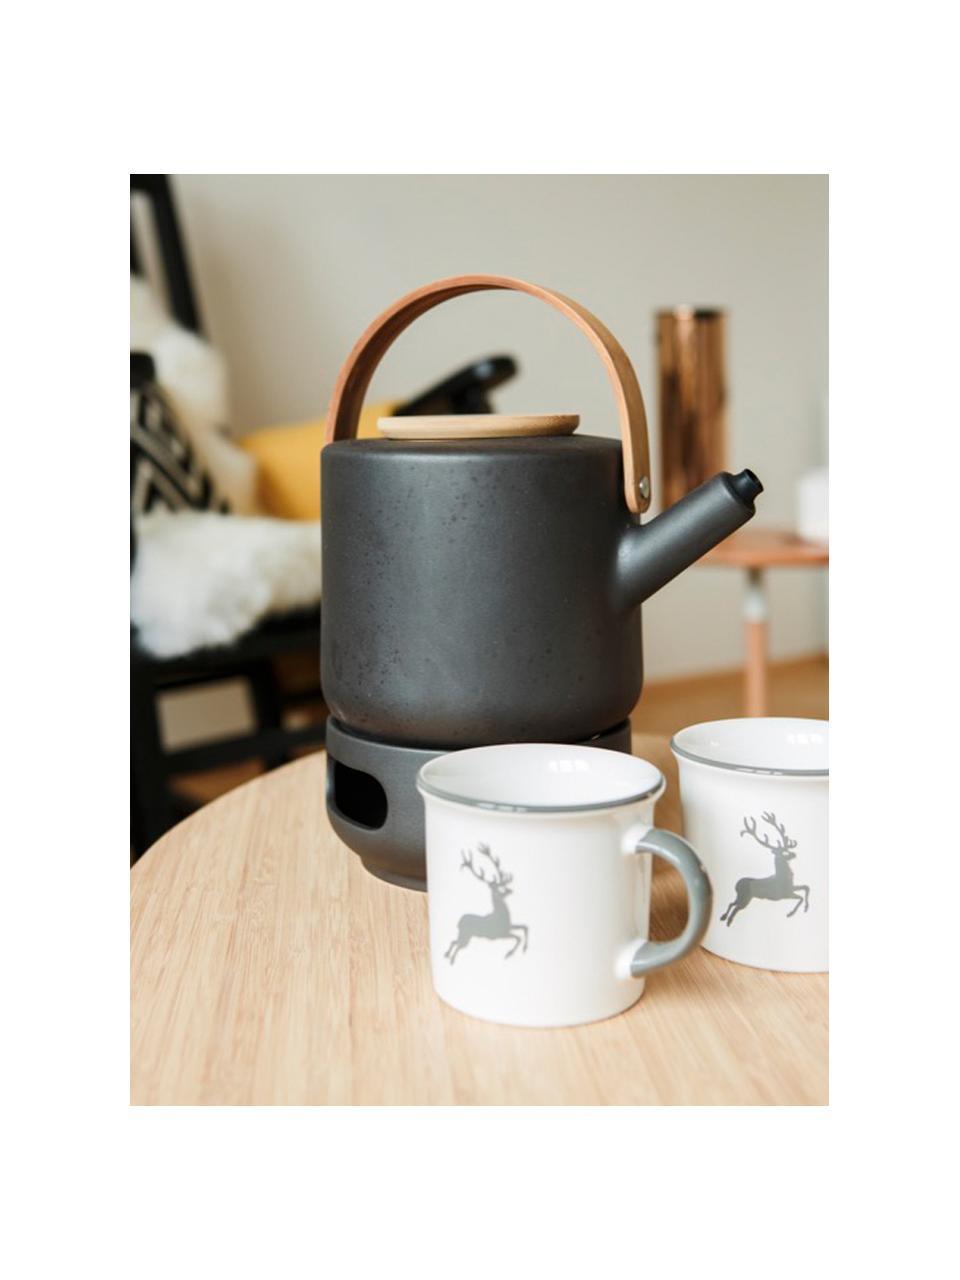 Handbemaltes Kaffeehaferl Classic Grauer Hirsch, Keramik, Grau,Weiß, 240 ml